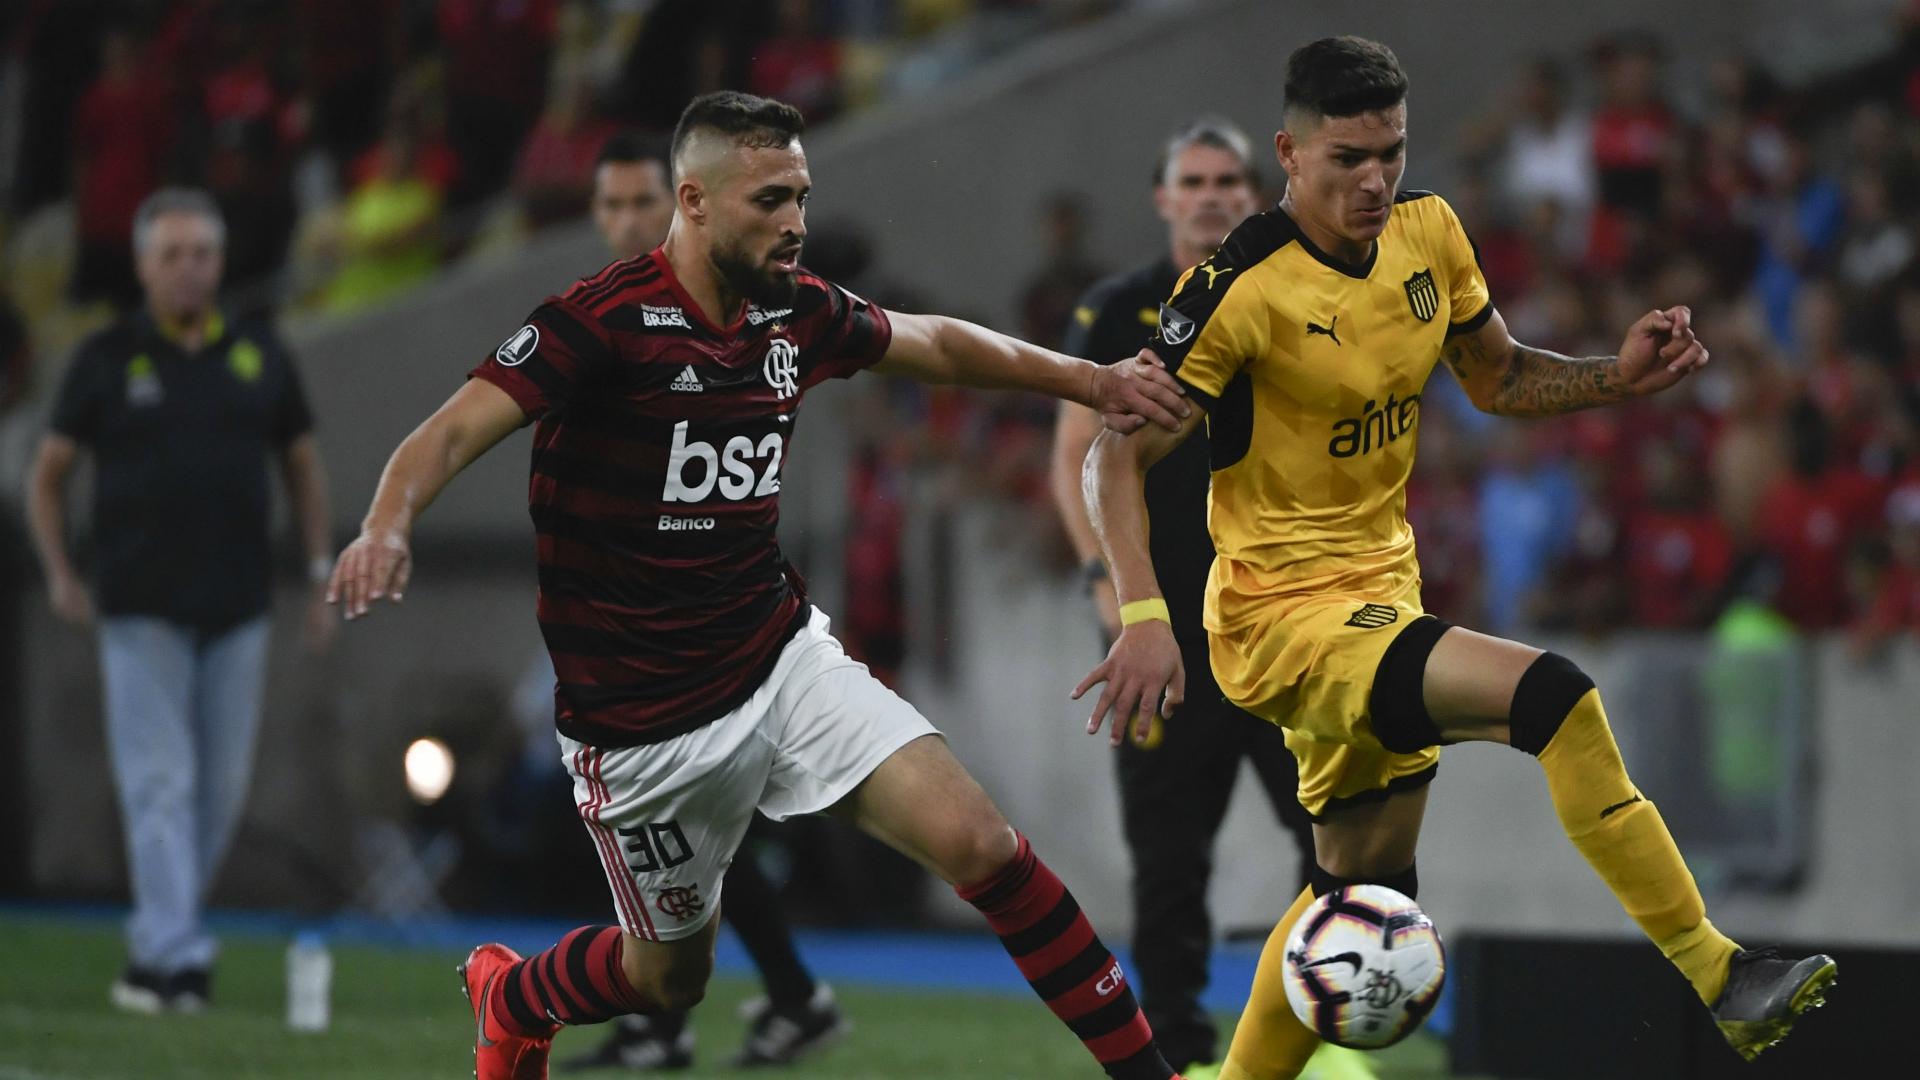 AC Milan complete €11m signing of Flamengo defender Duarte